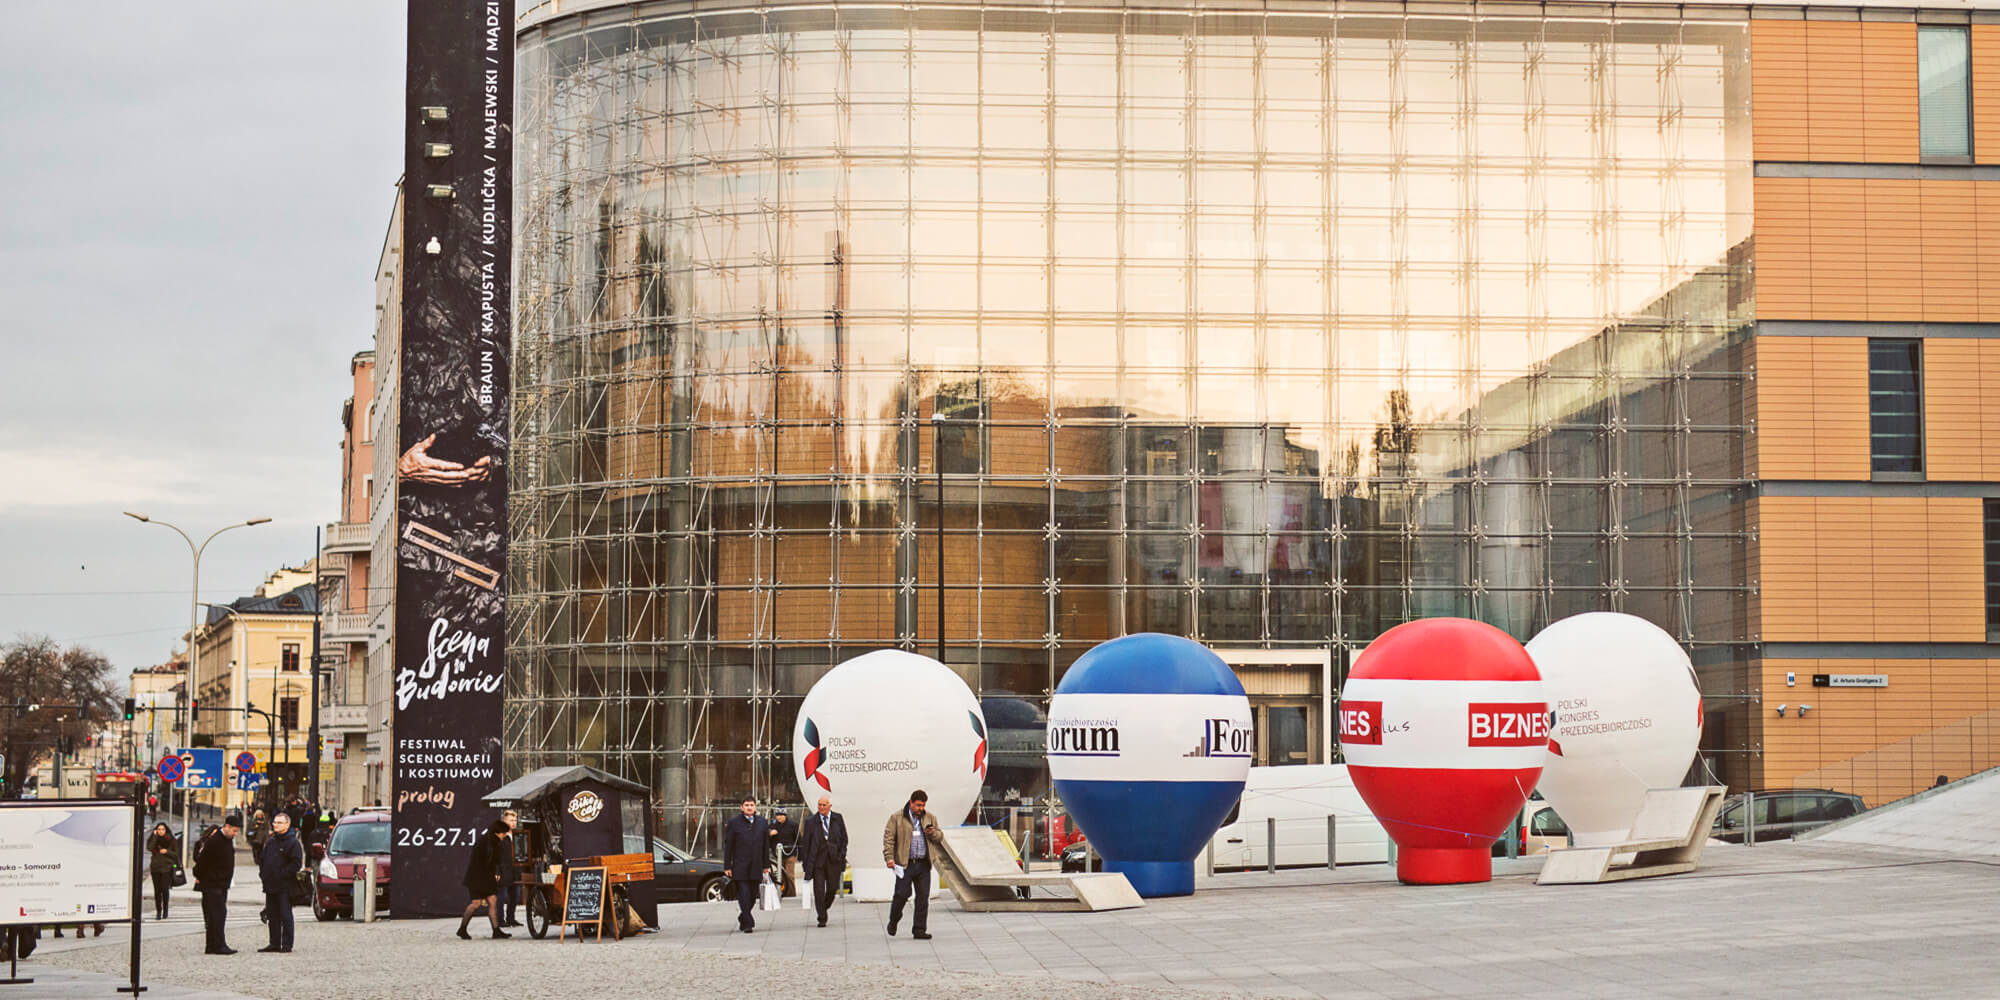 Balony reklamowe jako element promocji konferencji.